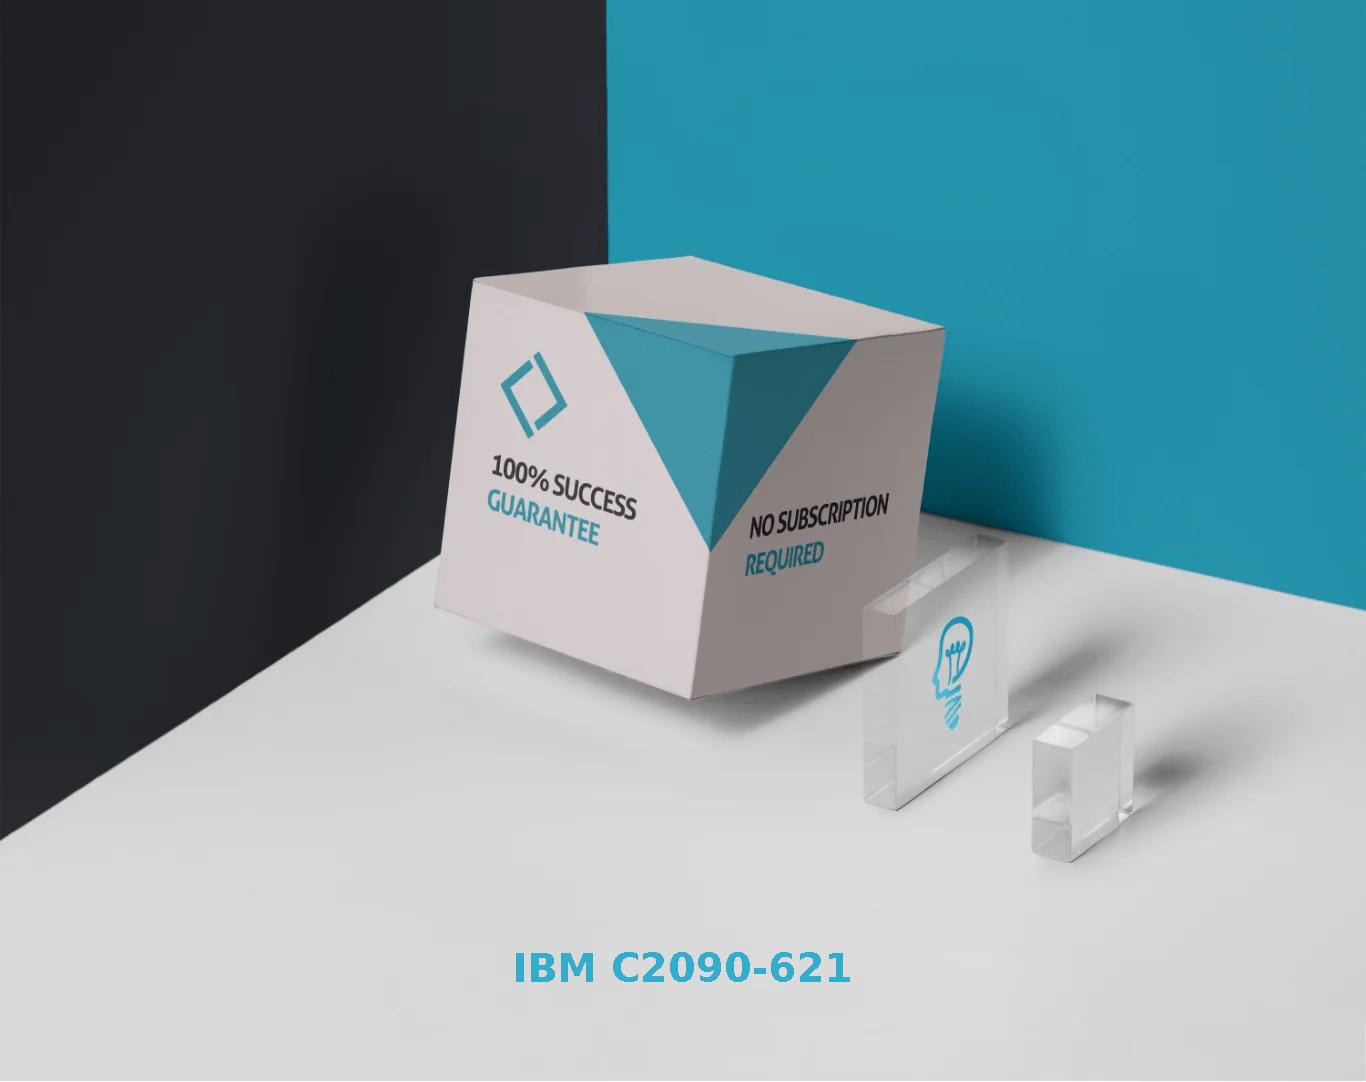 IBM C2090-621 Exams